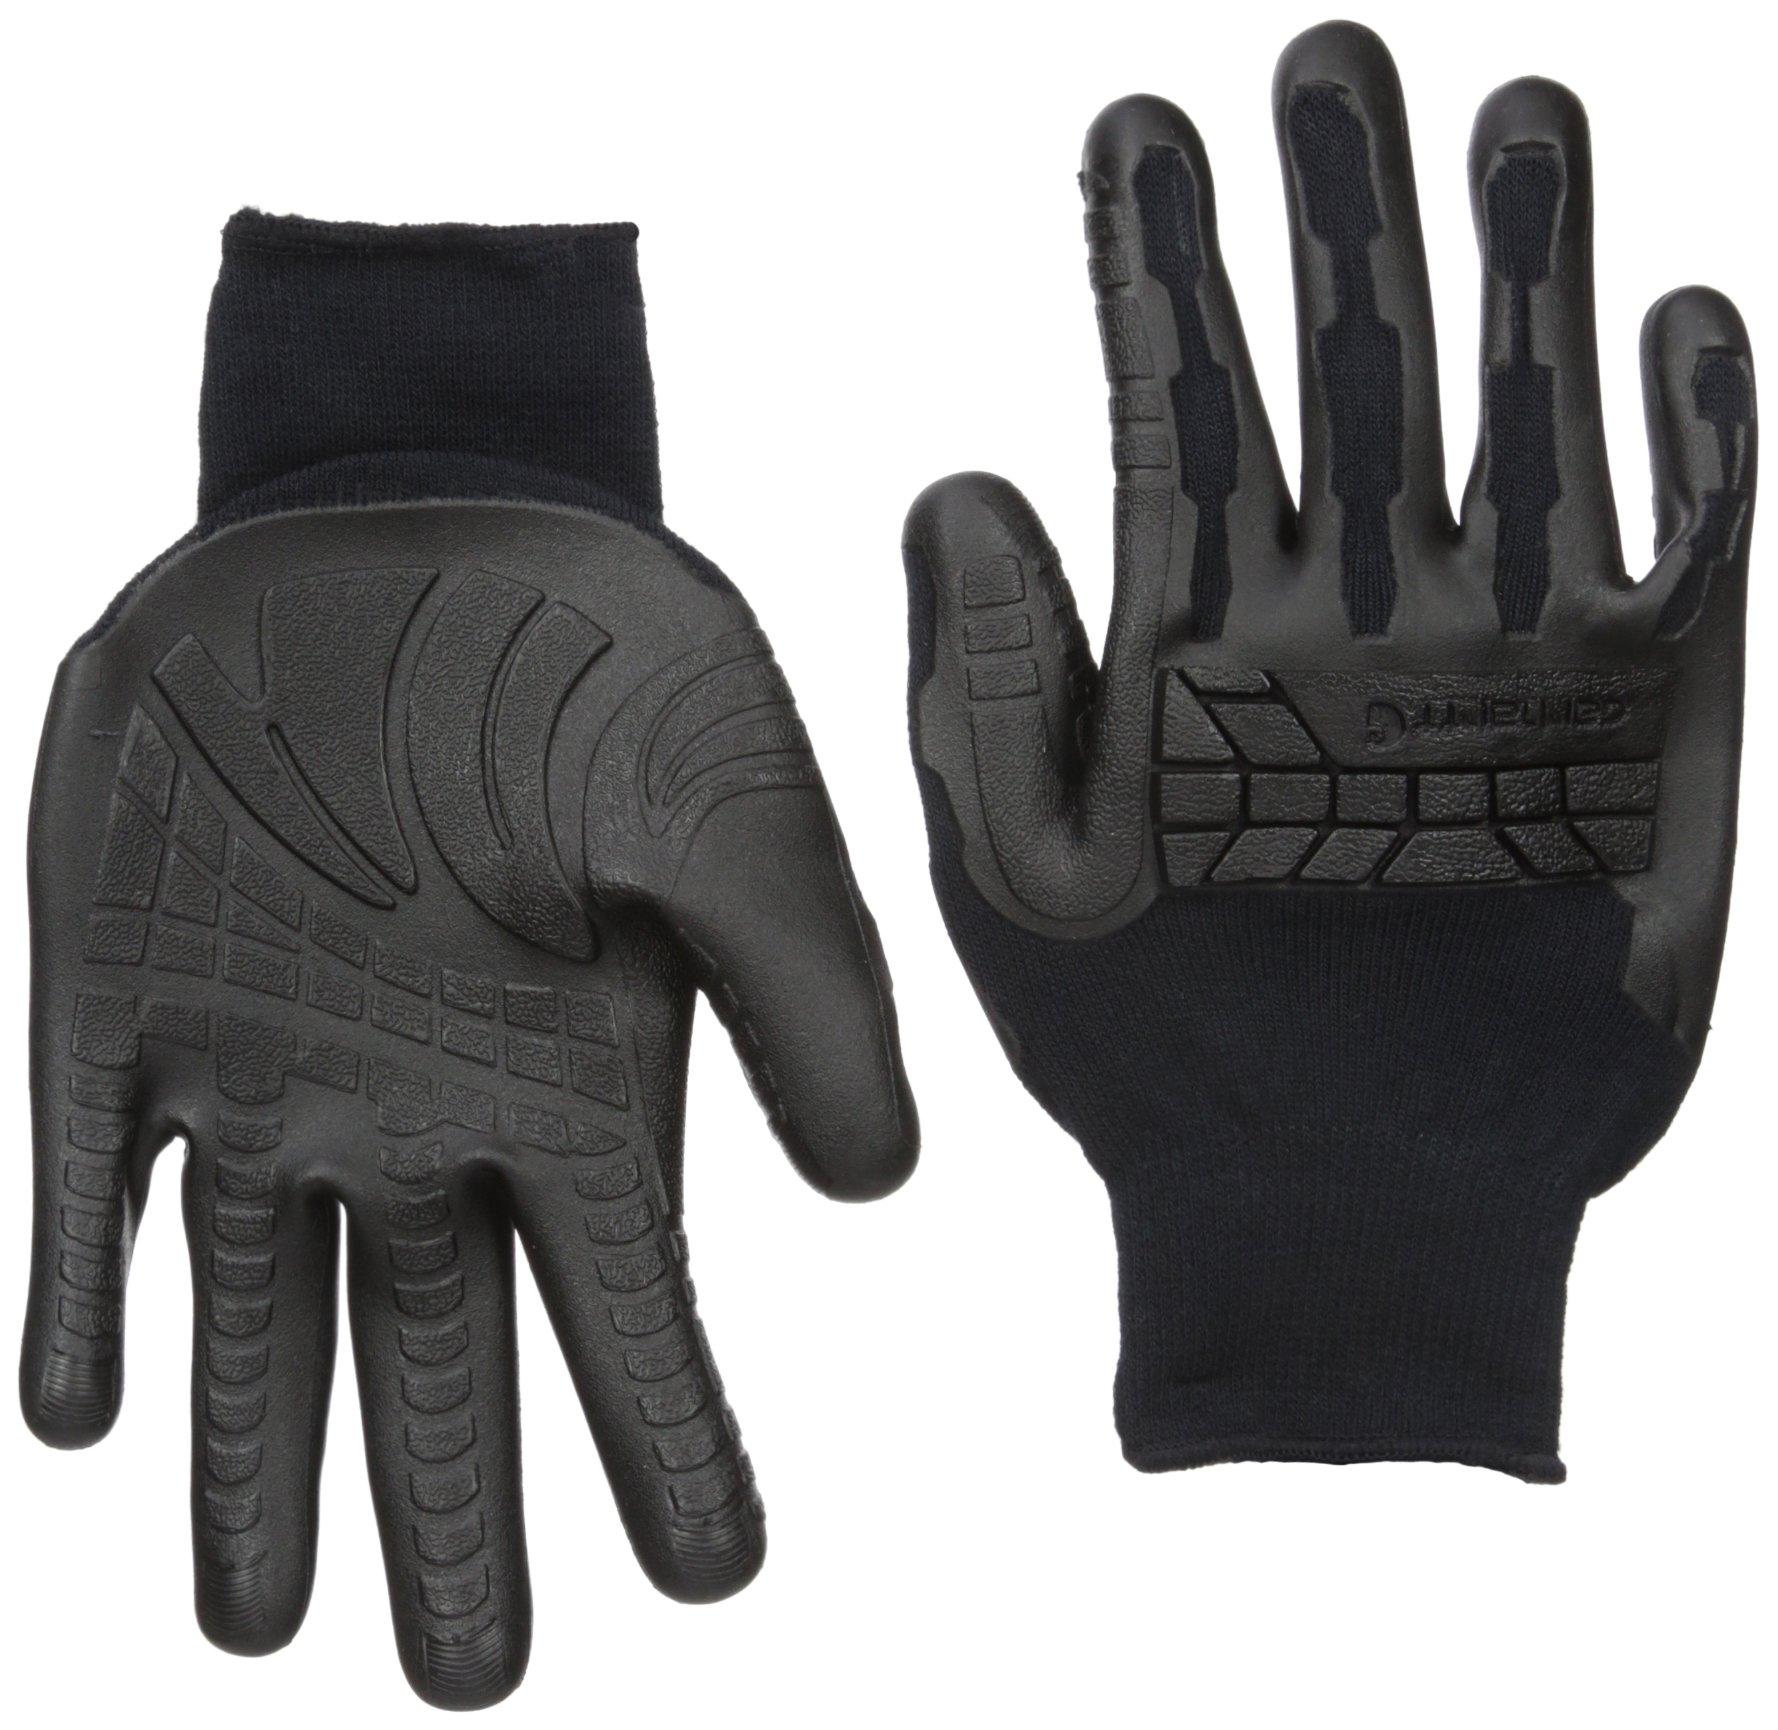 Carhartt Men's Ergo Knuckler Glove, black, X-Large by Carhartt (Image #1)